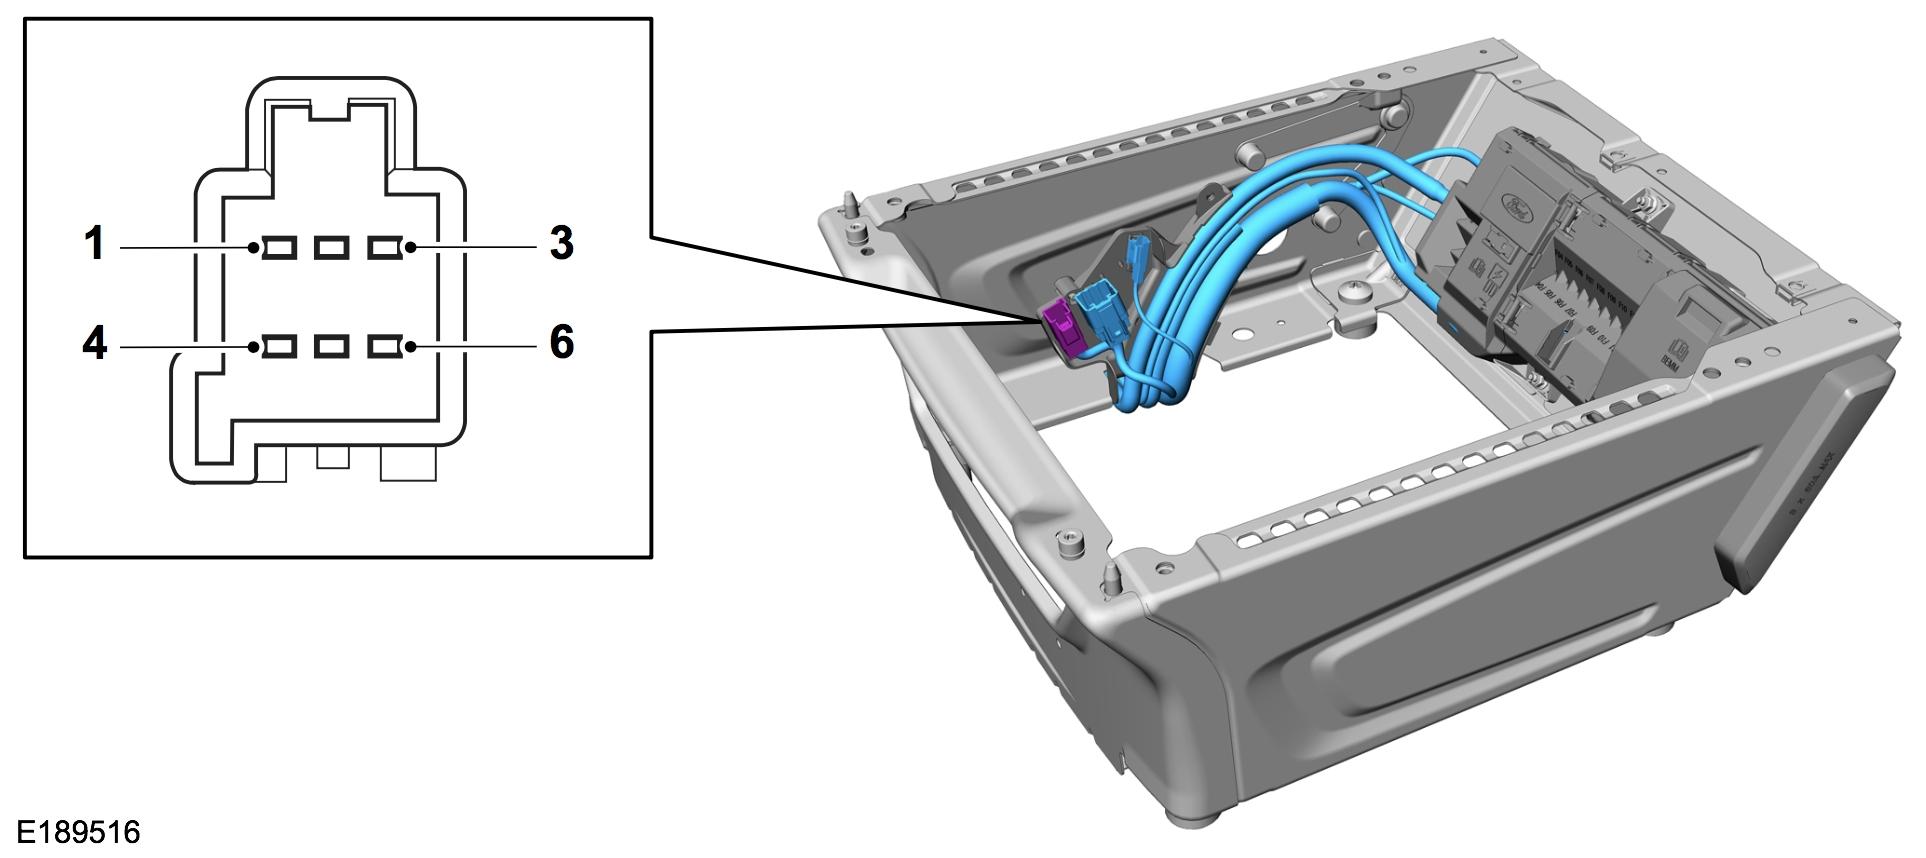 engine on signal via ford transit vehicle interface